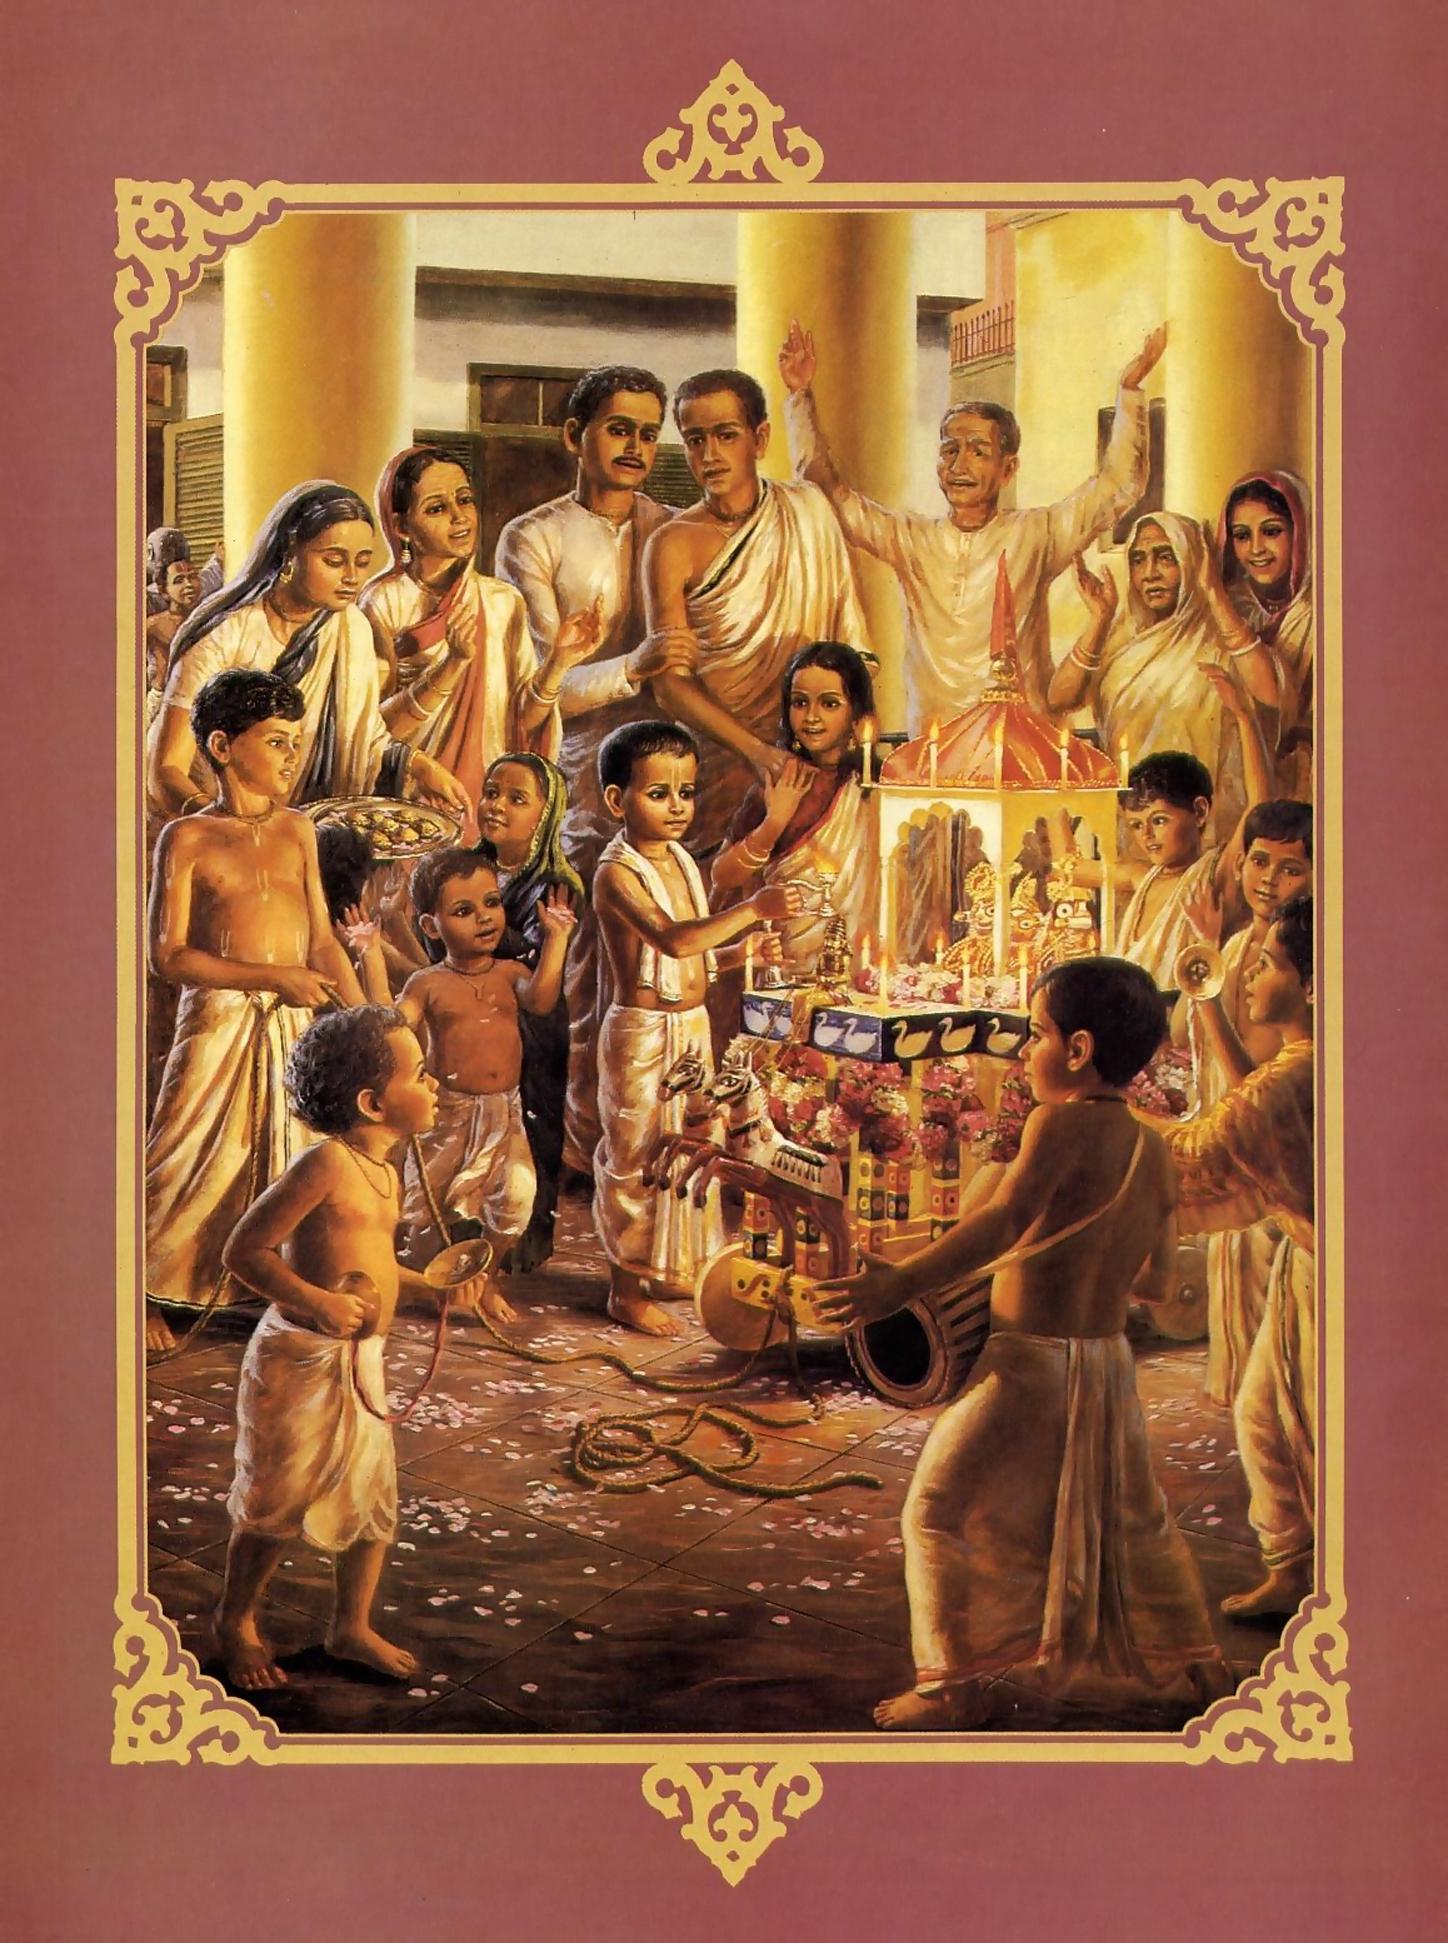 Srila Prabhupada's Childhood Ratha-Yatra Chariot Festival